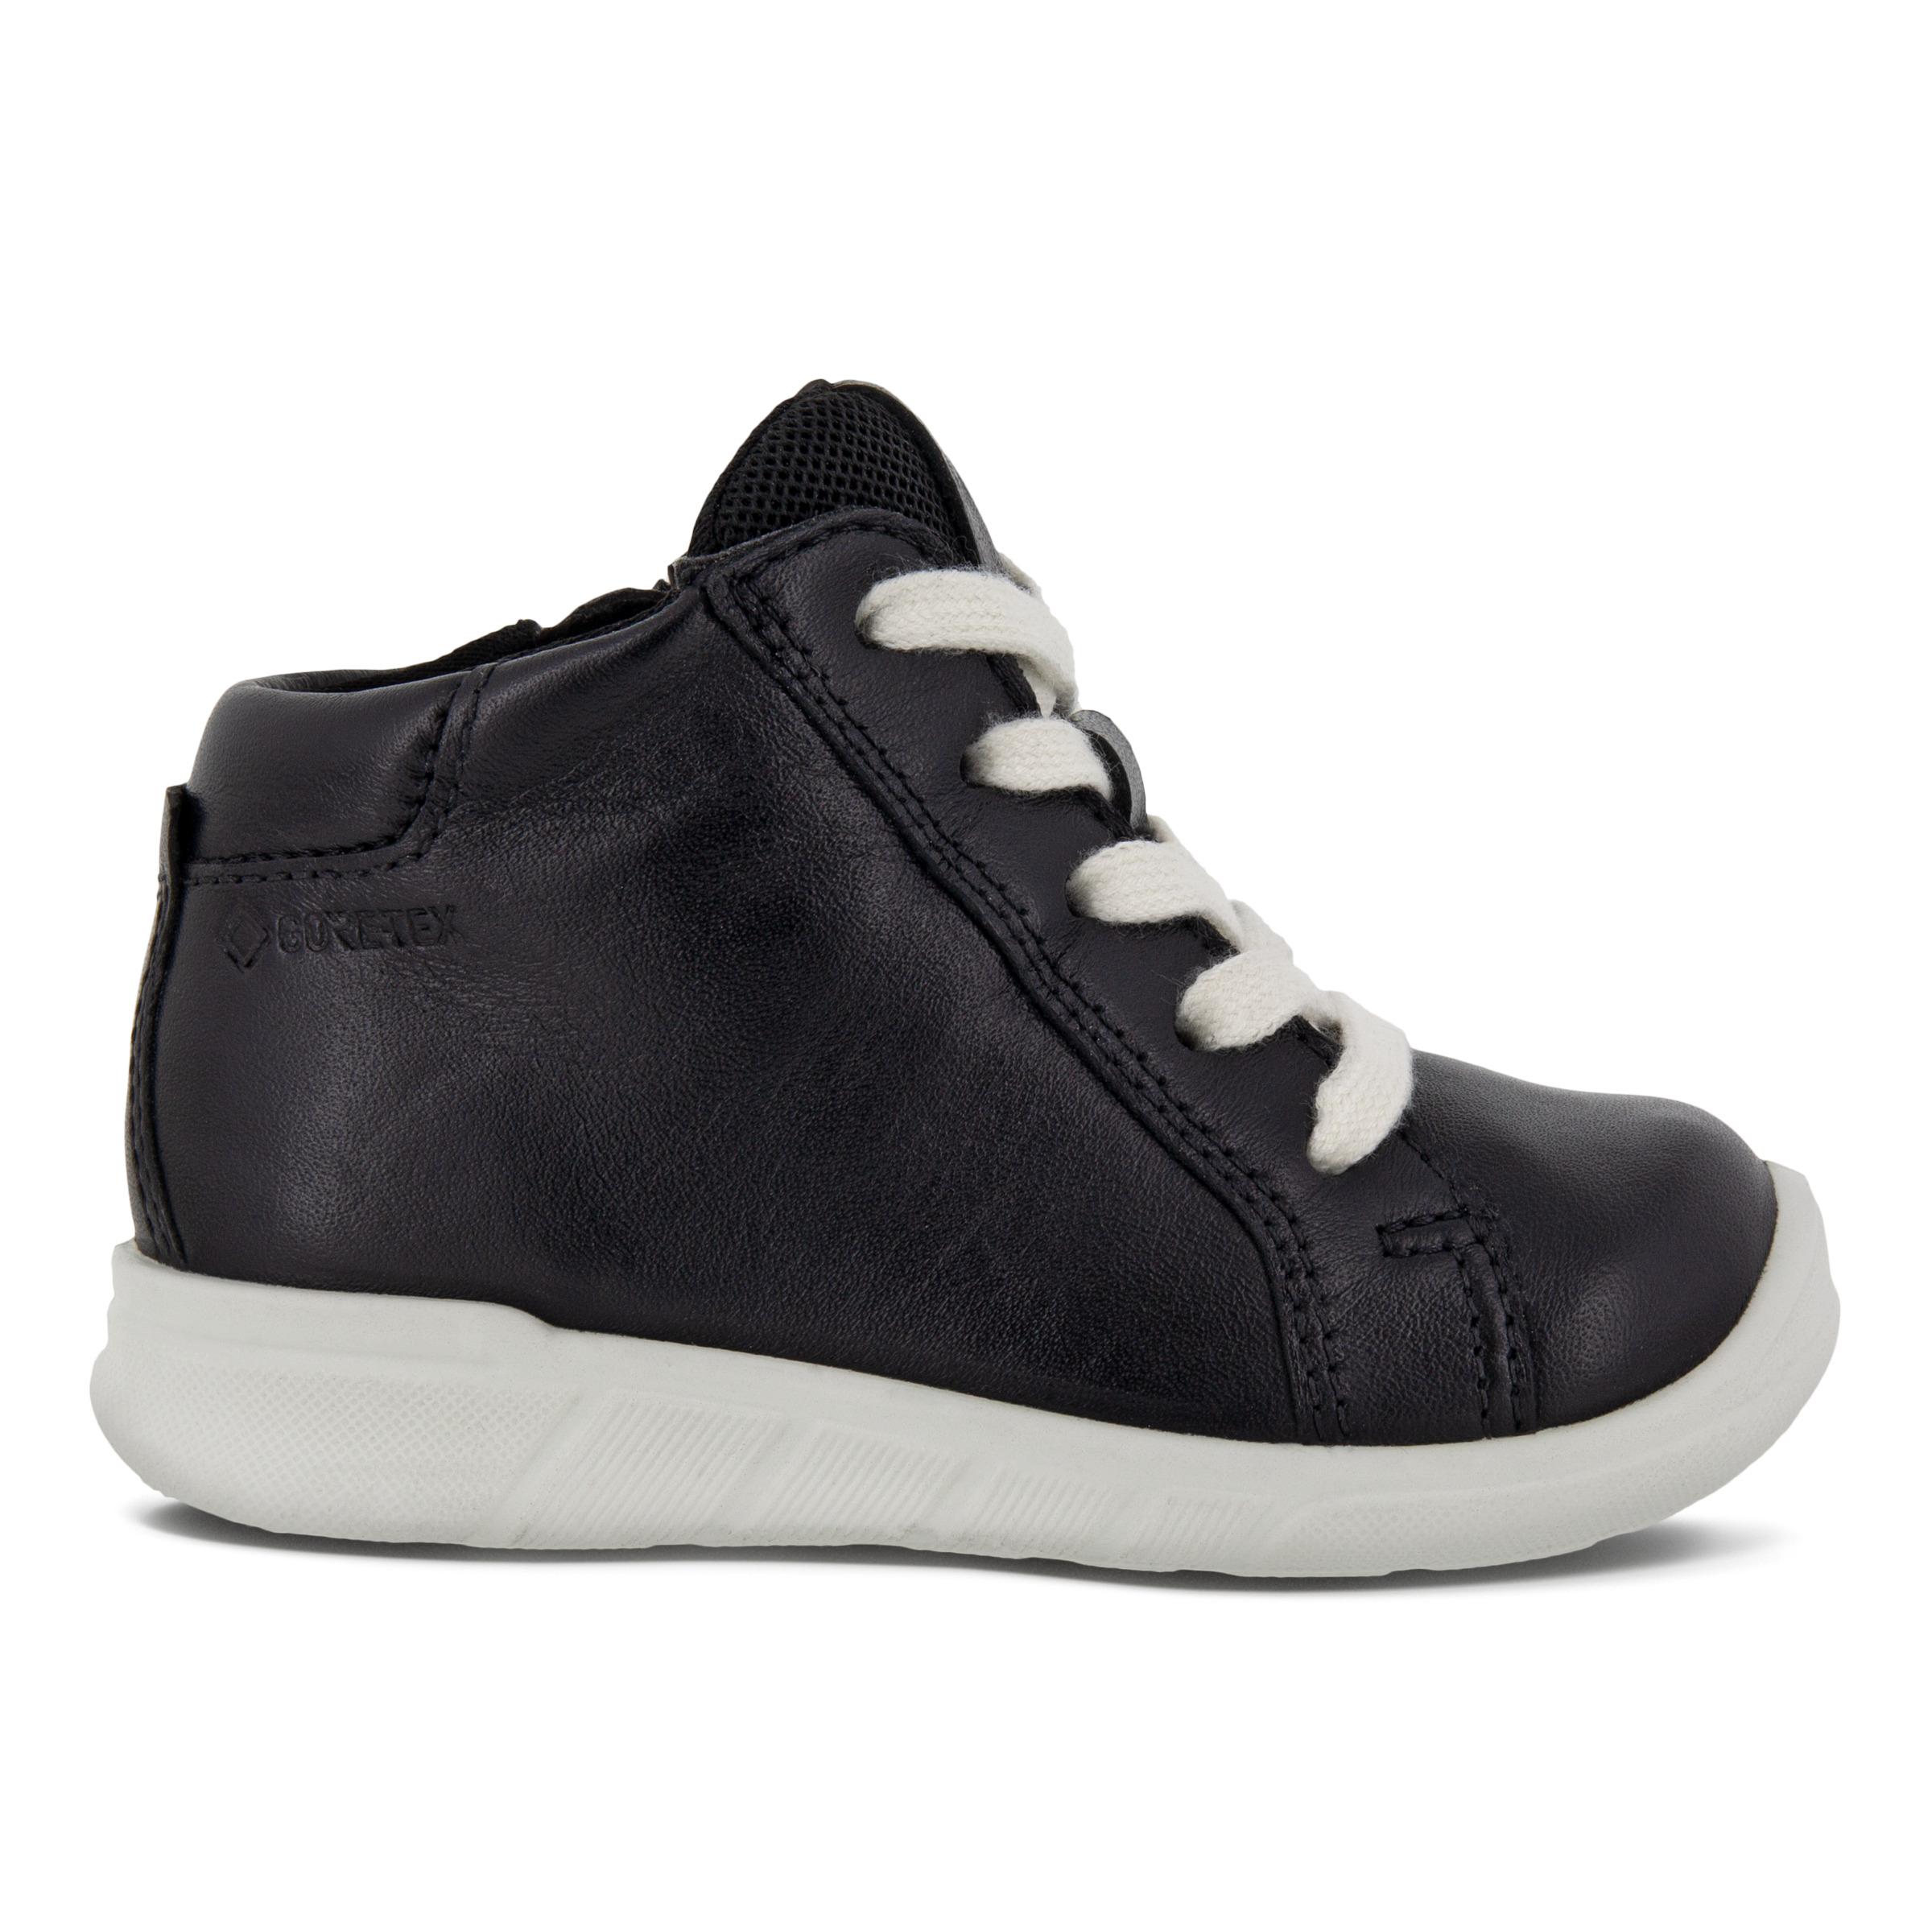 Ecco First støvle, black, 25